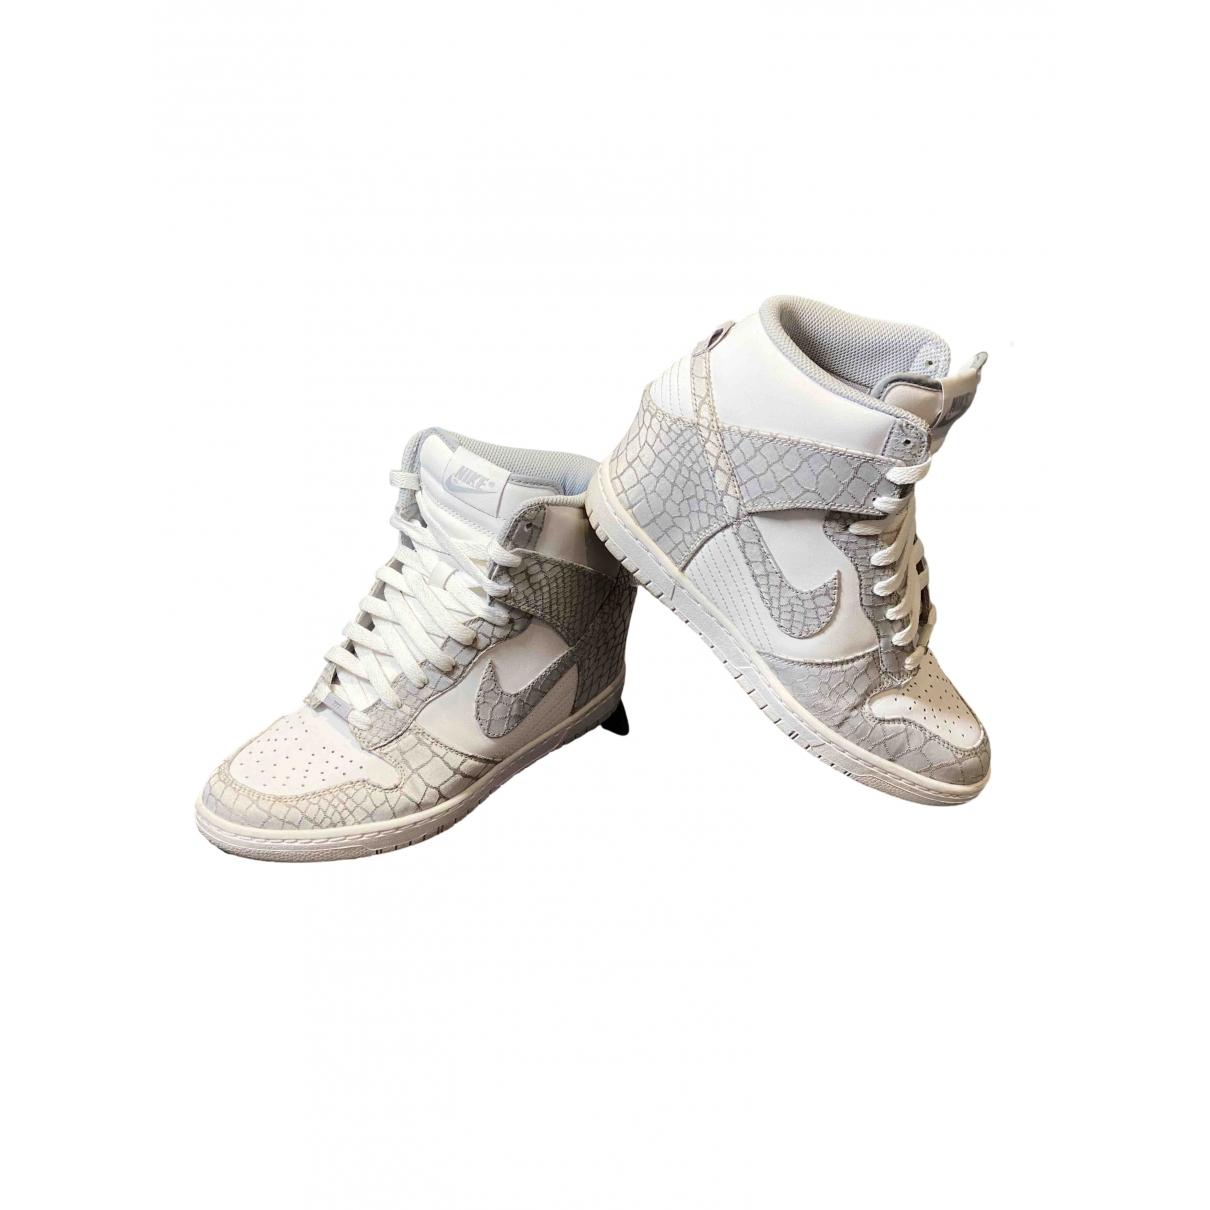 Nike Dunk Sky Sneakers in  Weiss Leder